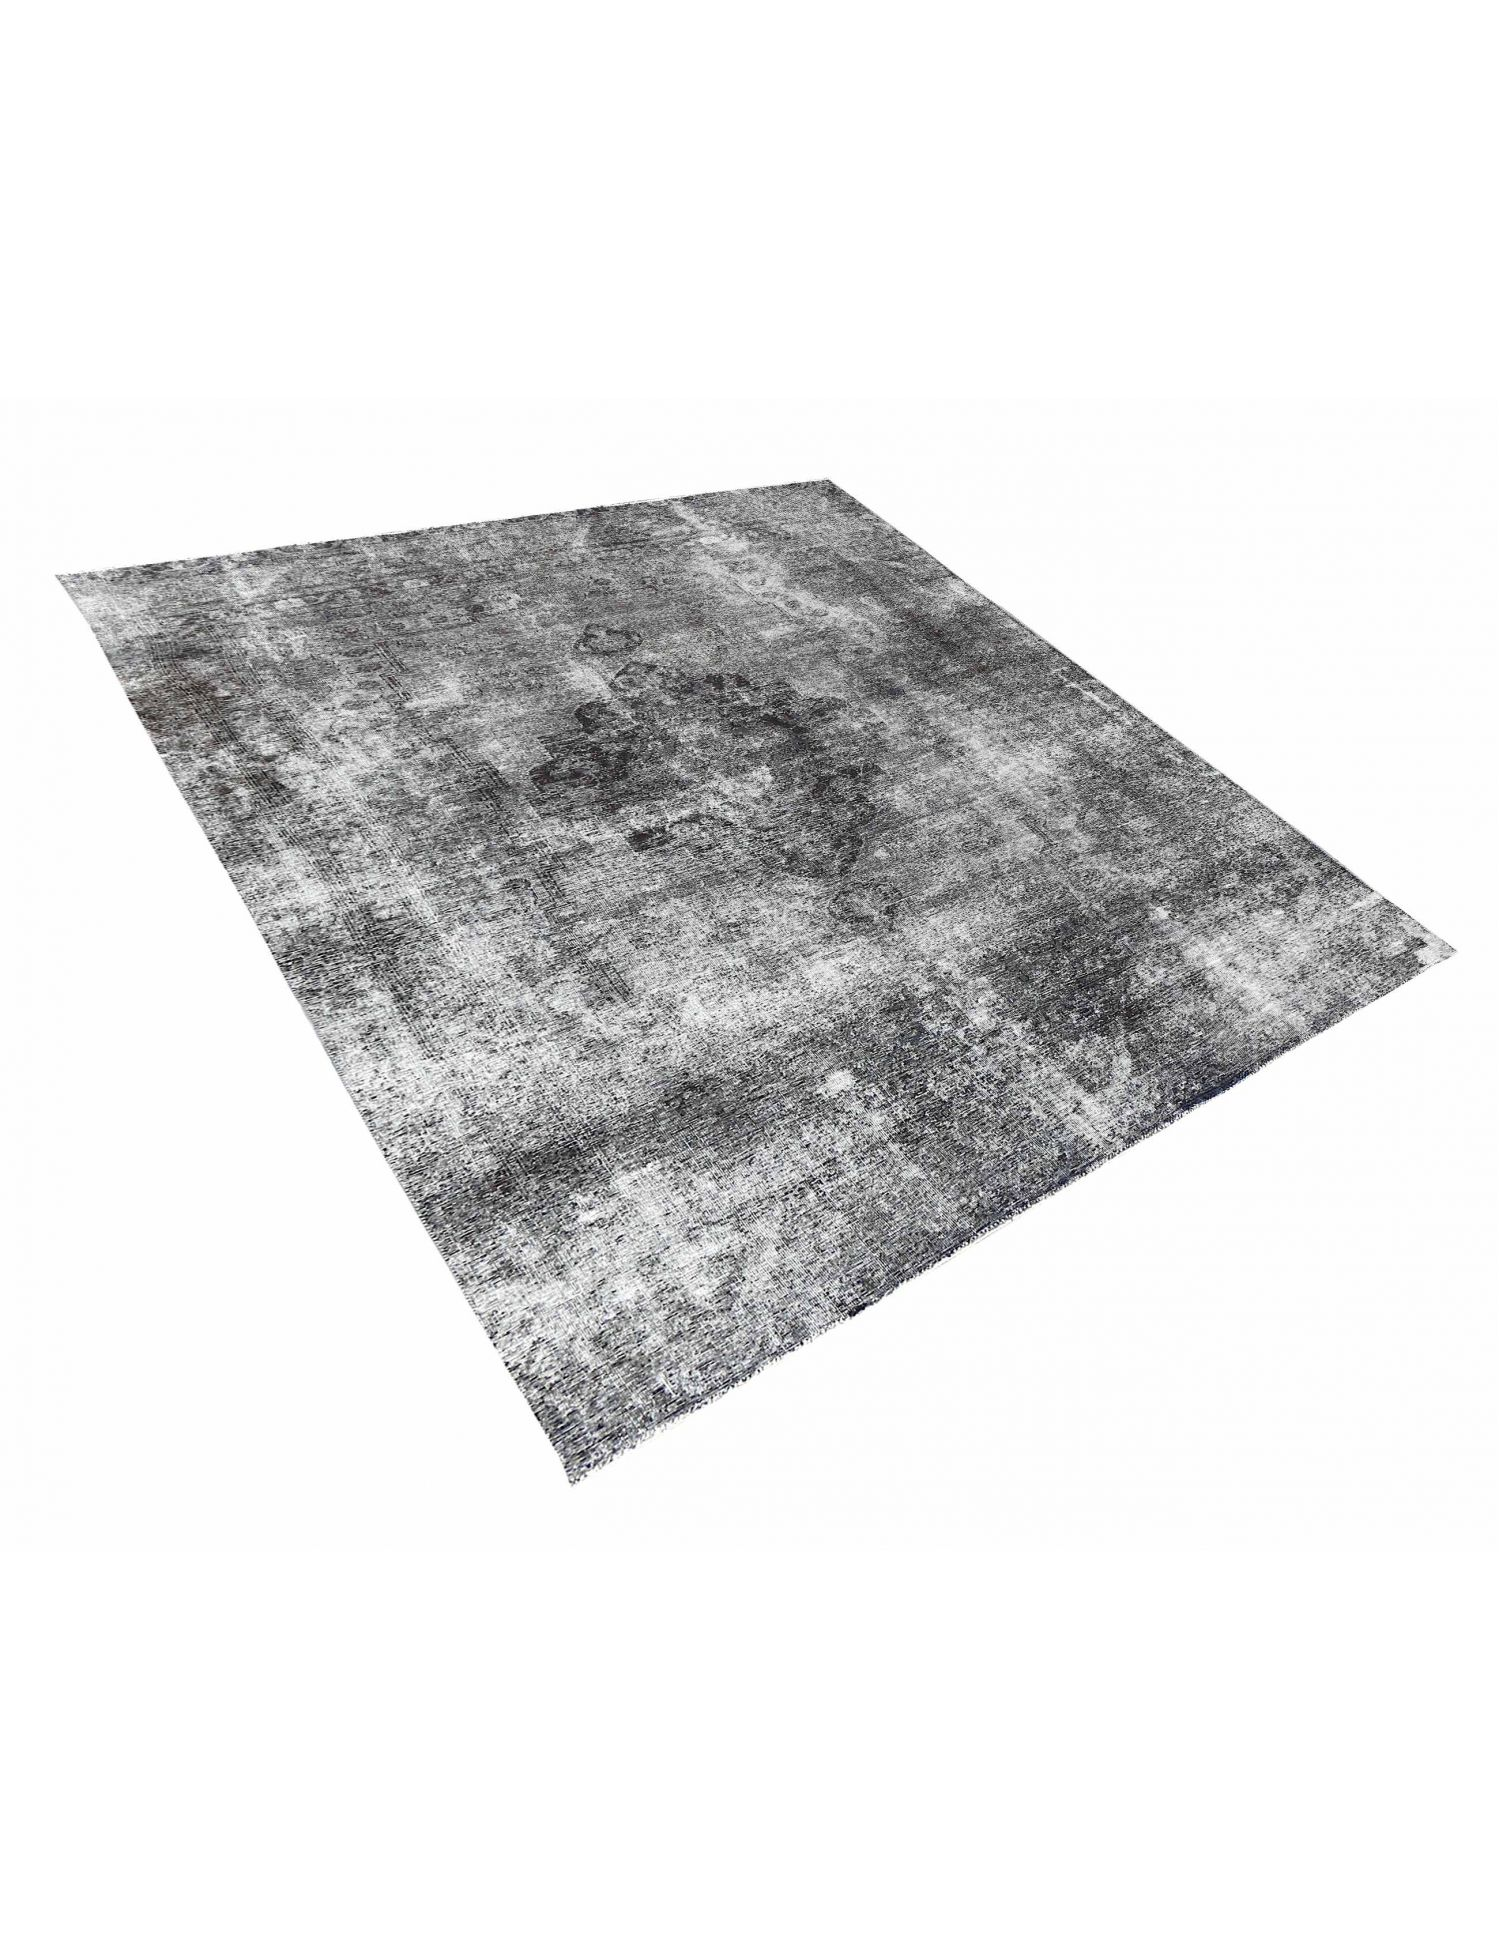 Vintage Carpet  black <br/>346 x 238 cm